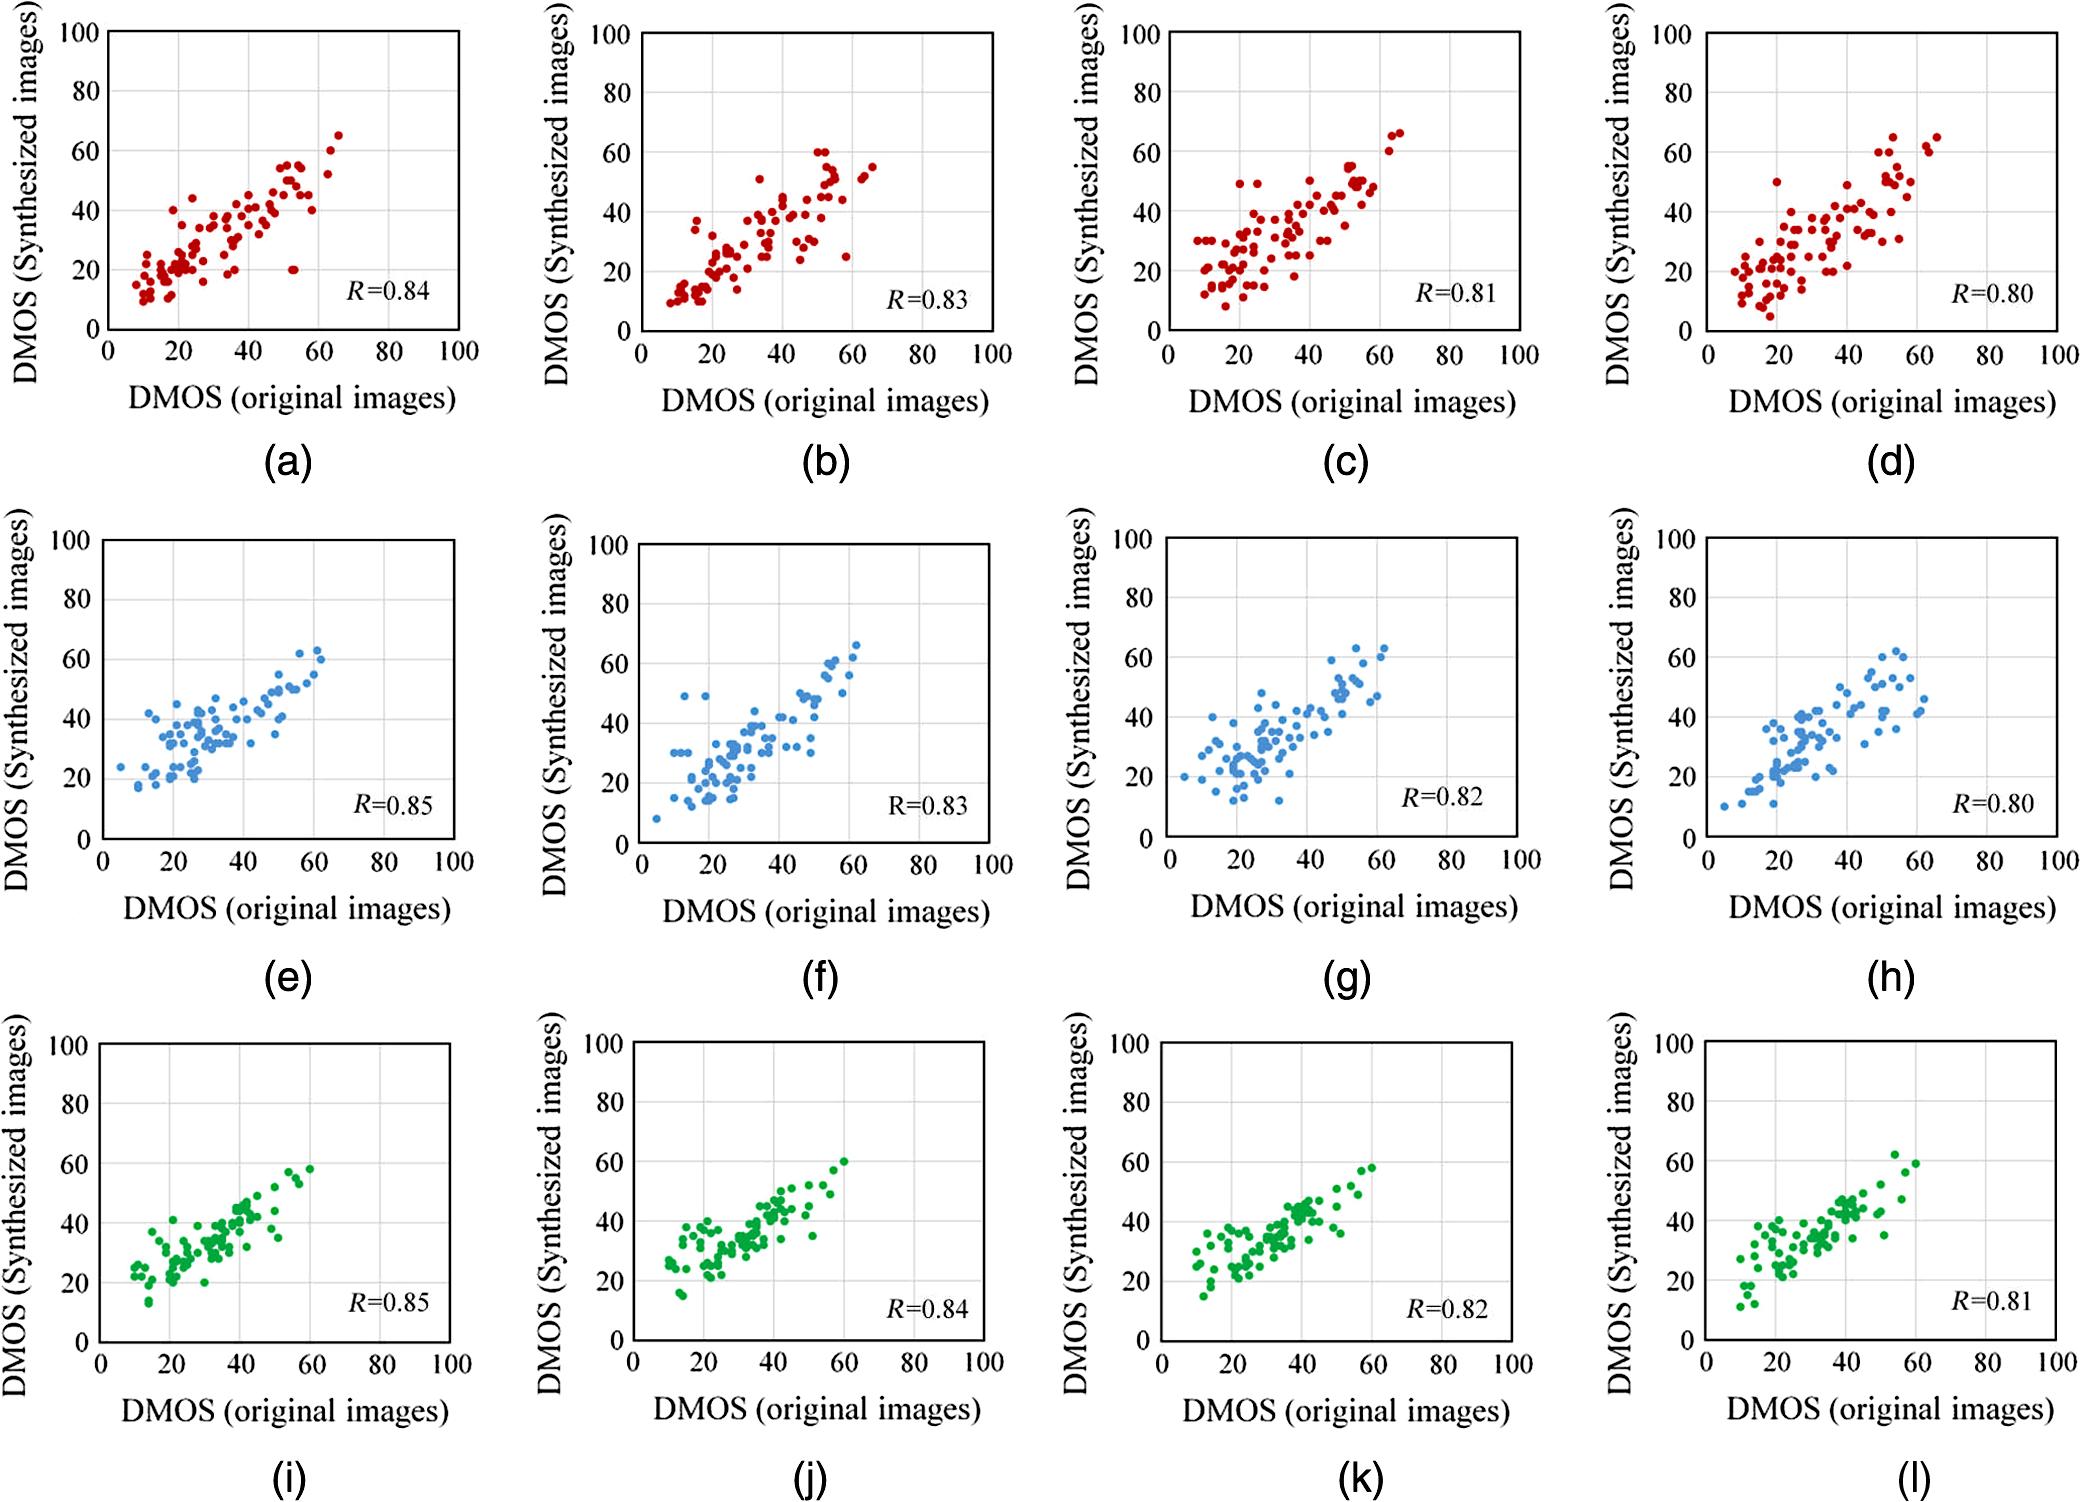 Hybrid generativediscriminative approach to age invariant face hybrid generativediscriminative approach to age invariant face recognition fandeluxe Gallery